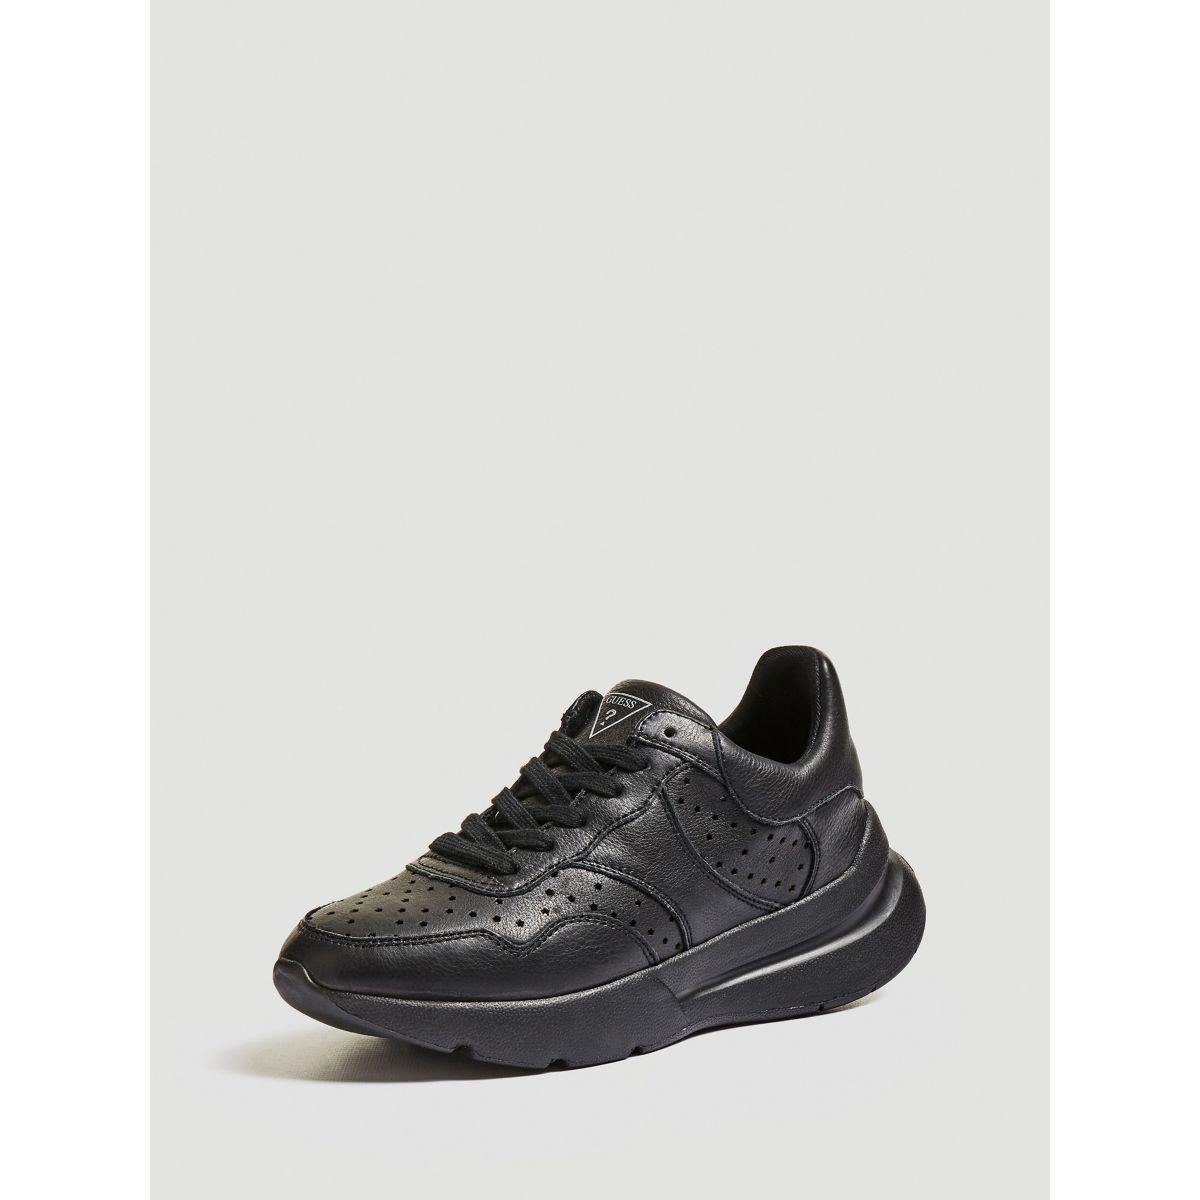 Sneaker Minca Cuir Veritable